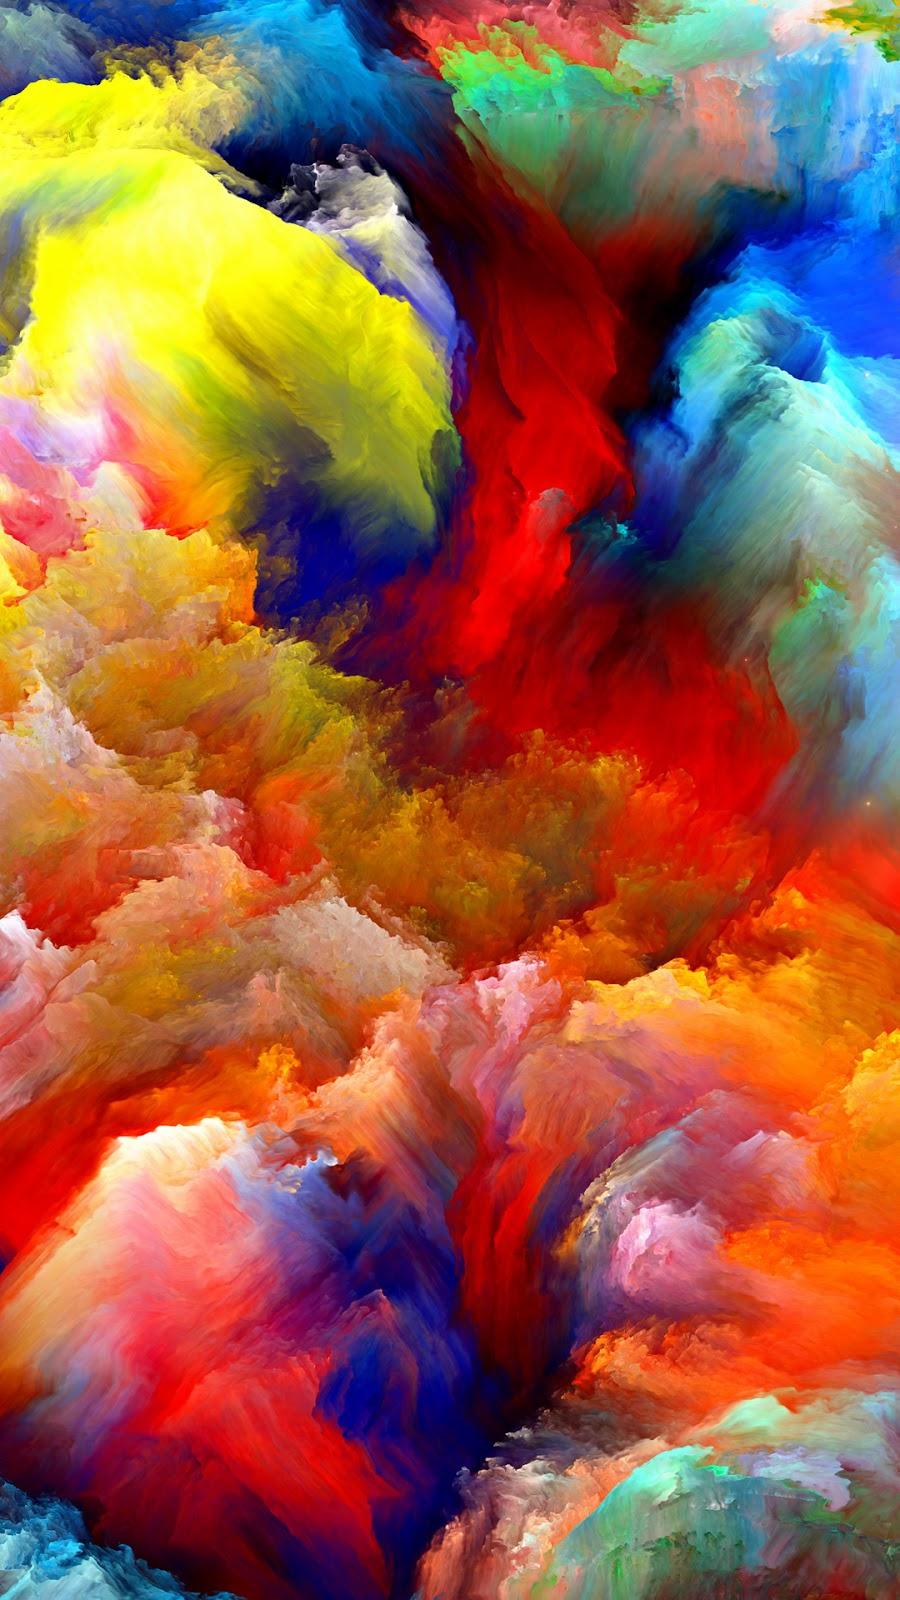 Wallpaper Android Abstrak Colorful Lukisan Awan